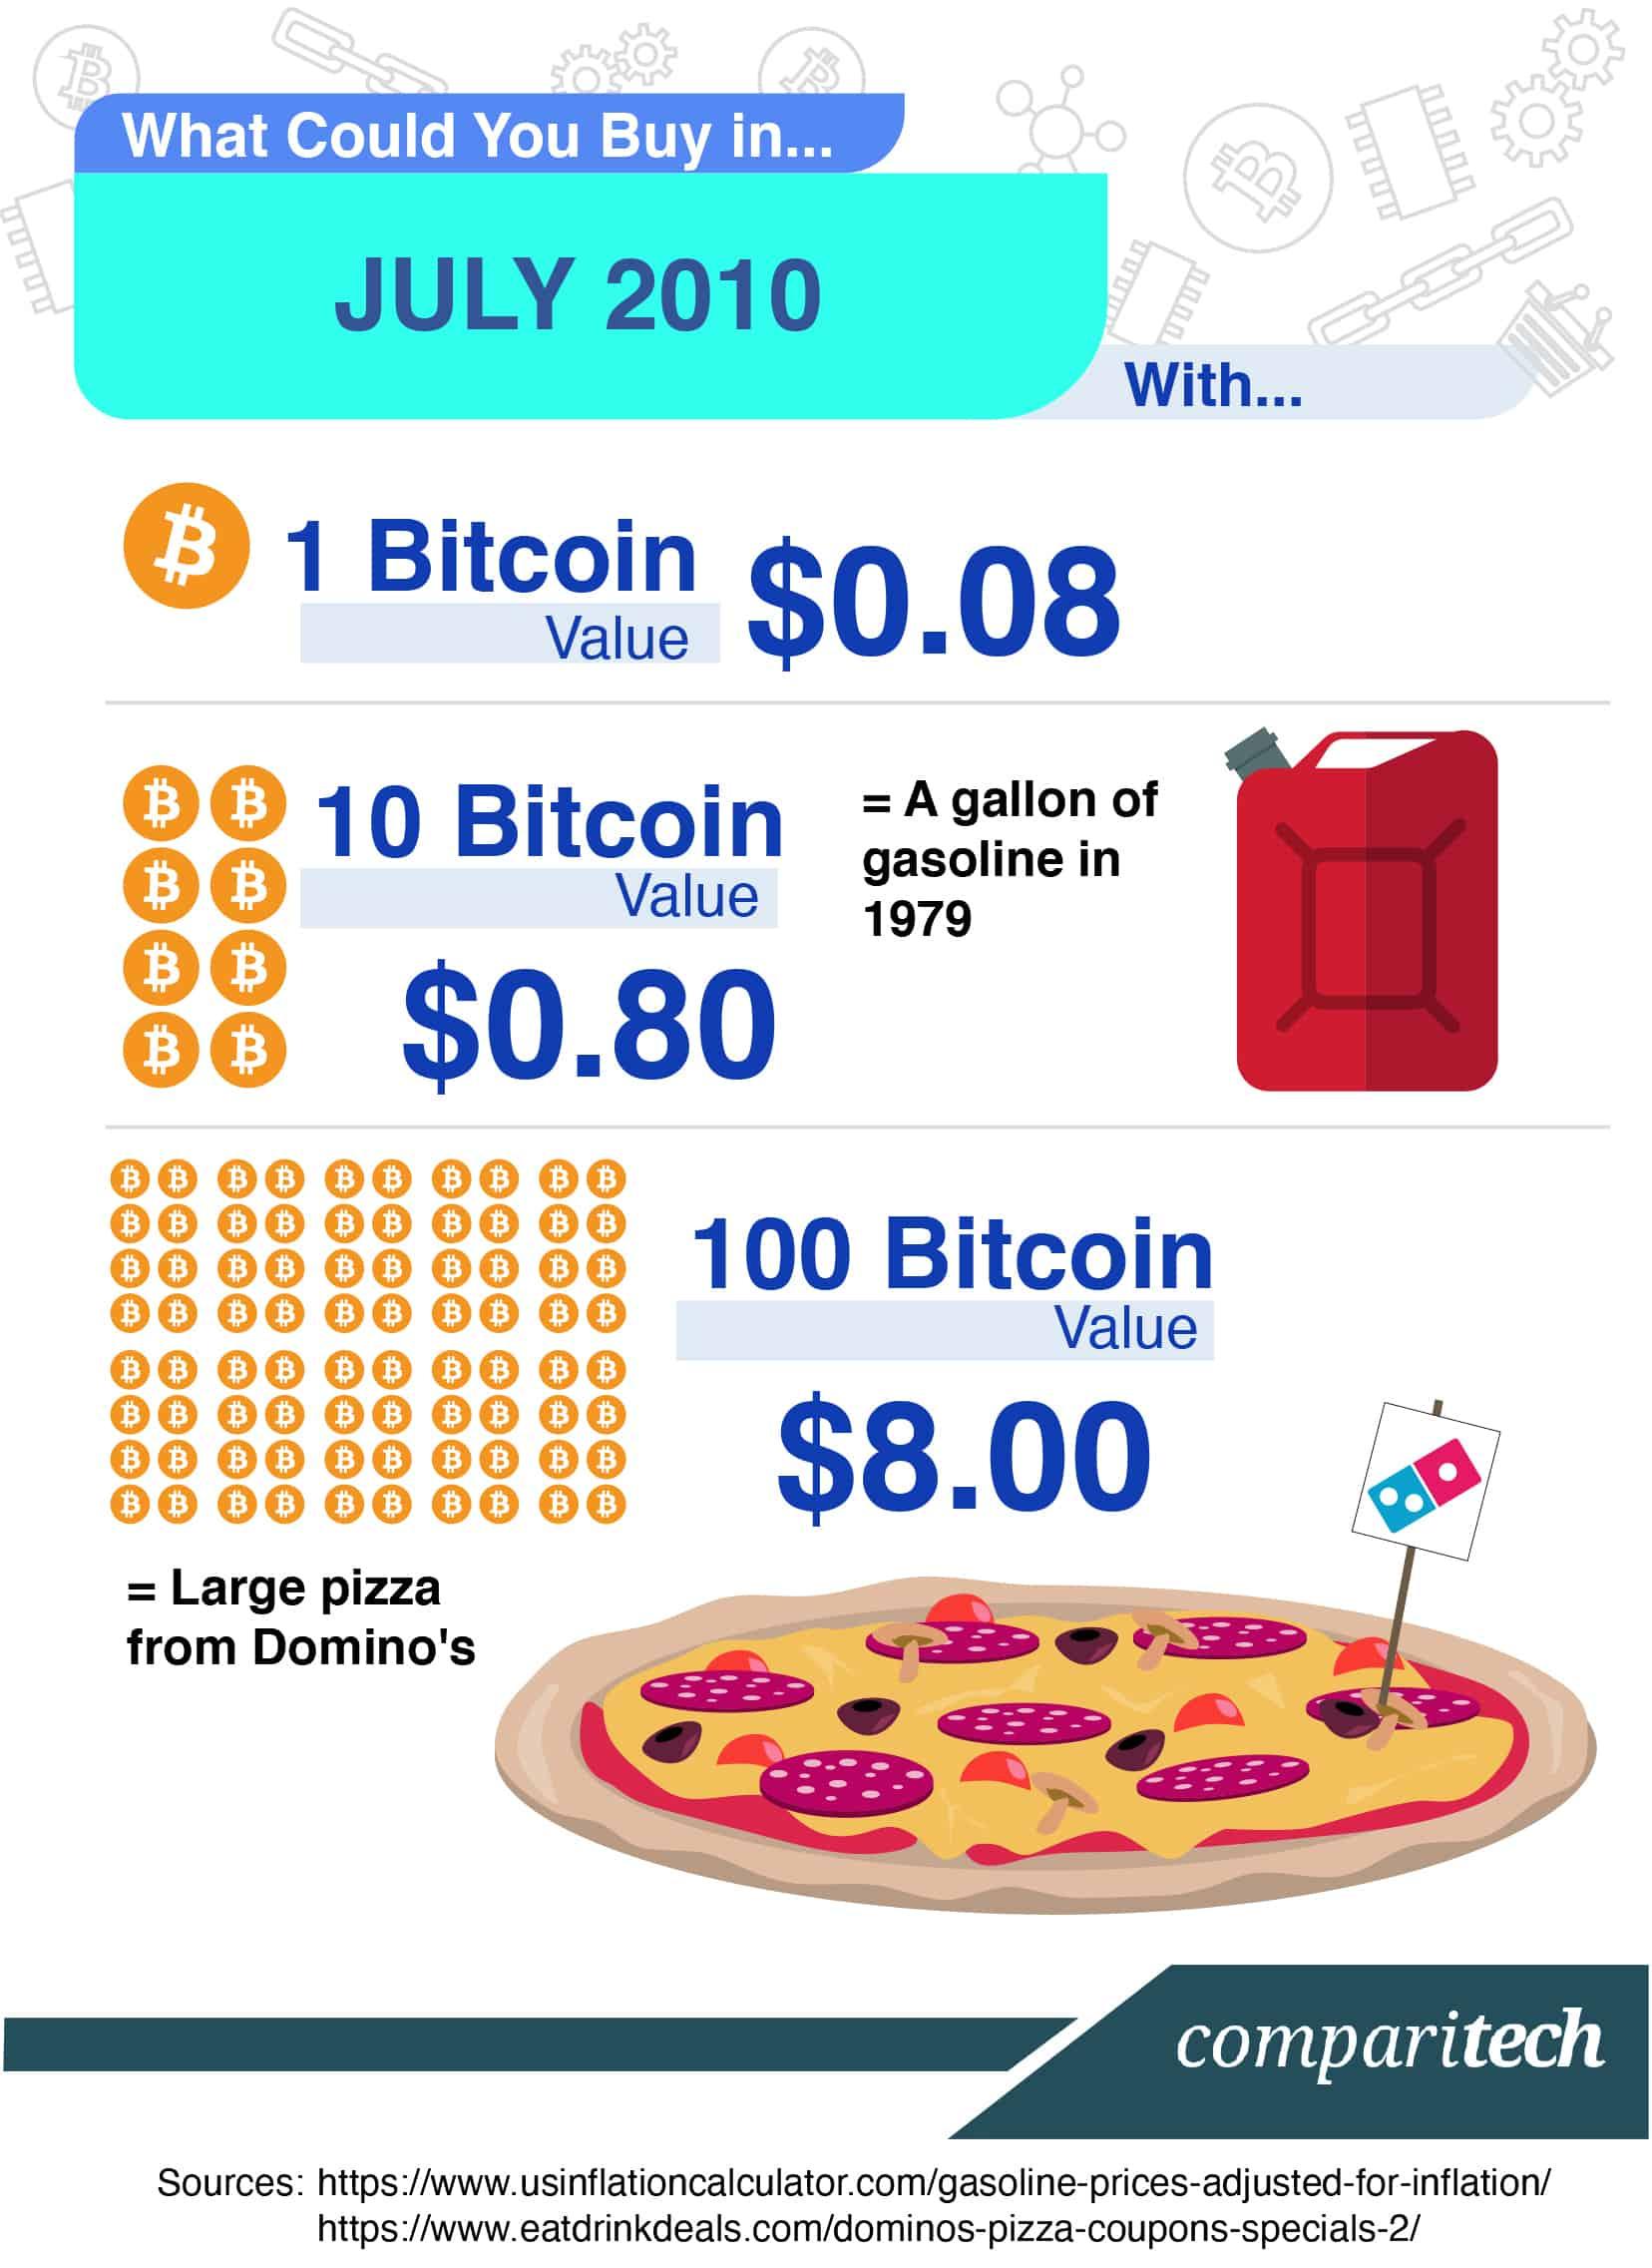 Bitcoin Price in 2010